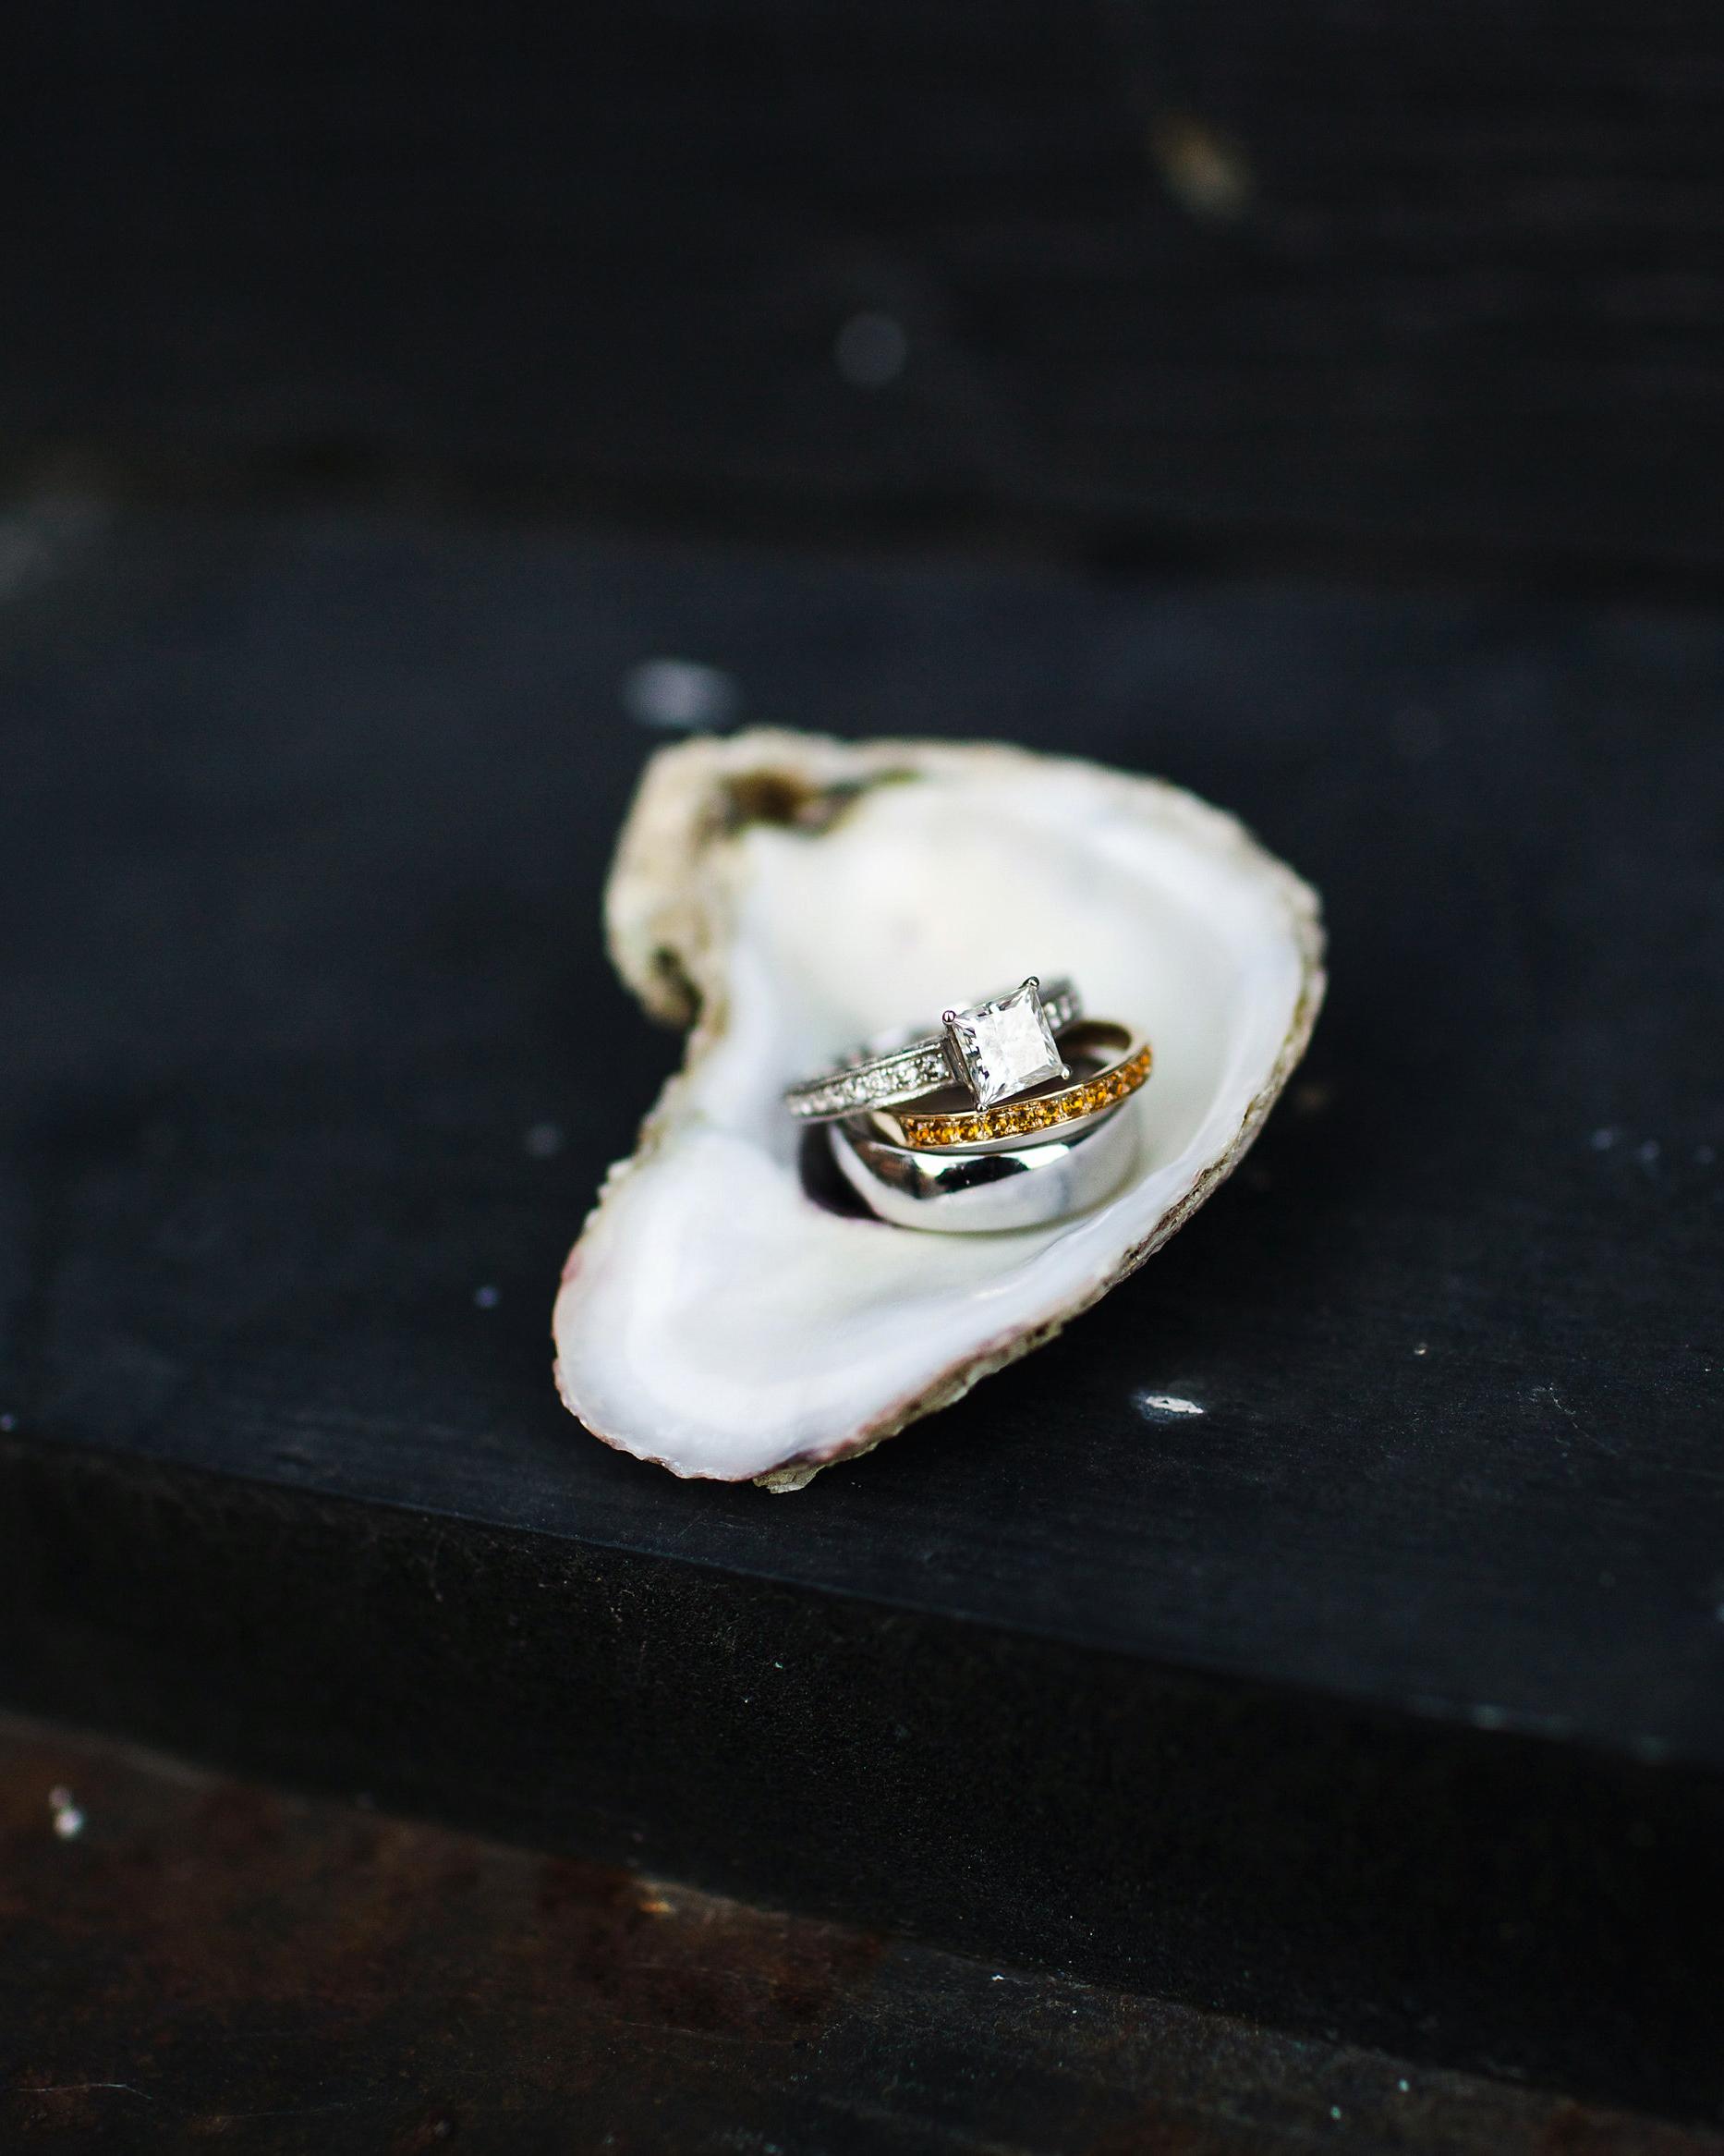 lauren-jake-wedding-oyster-7370-s111838-0315.jpg